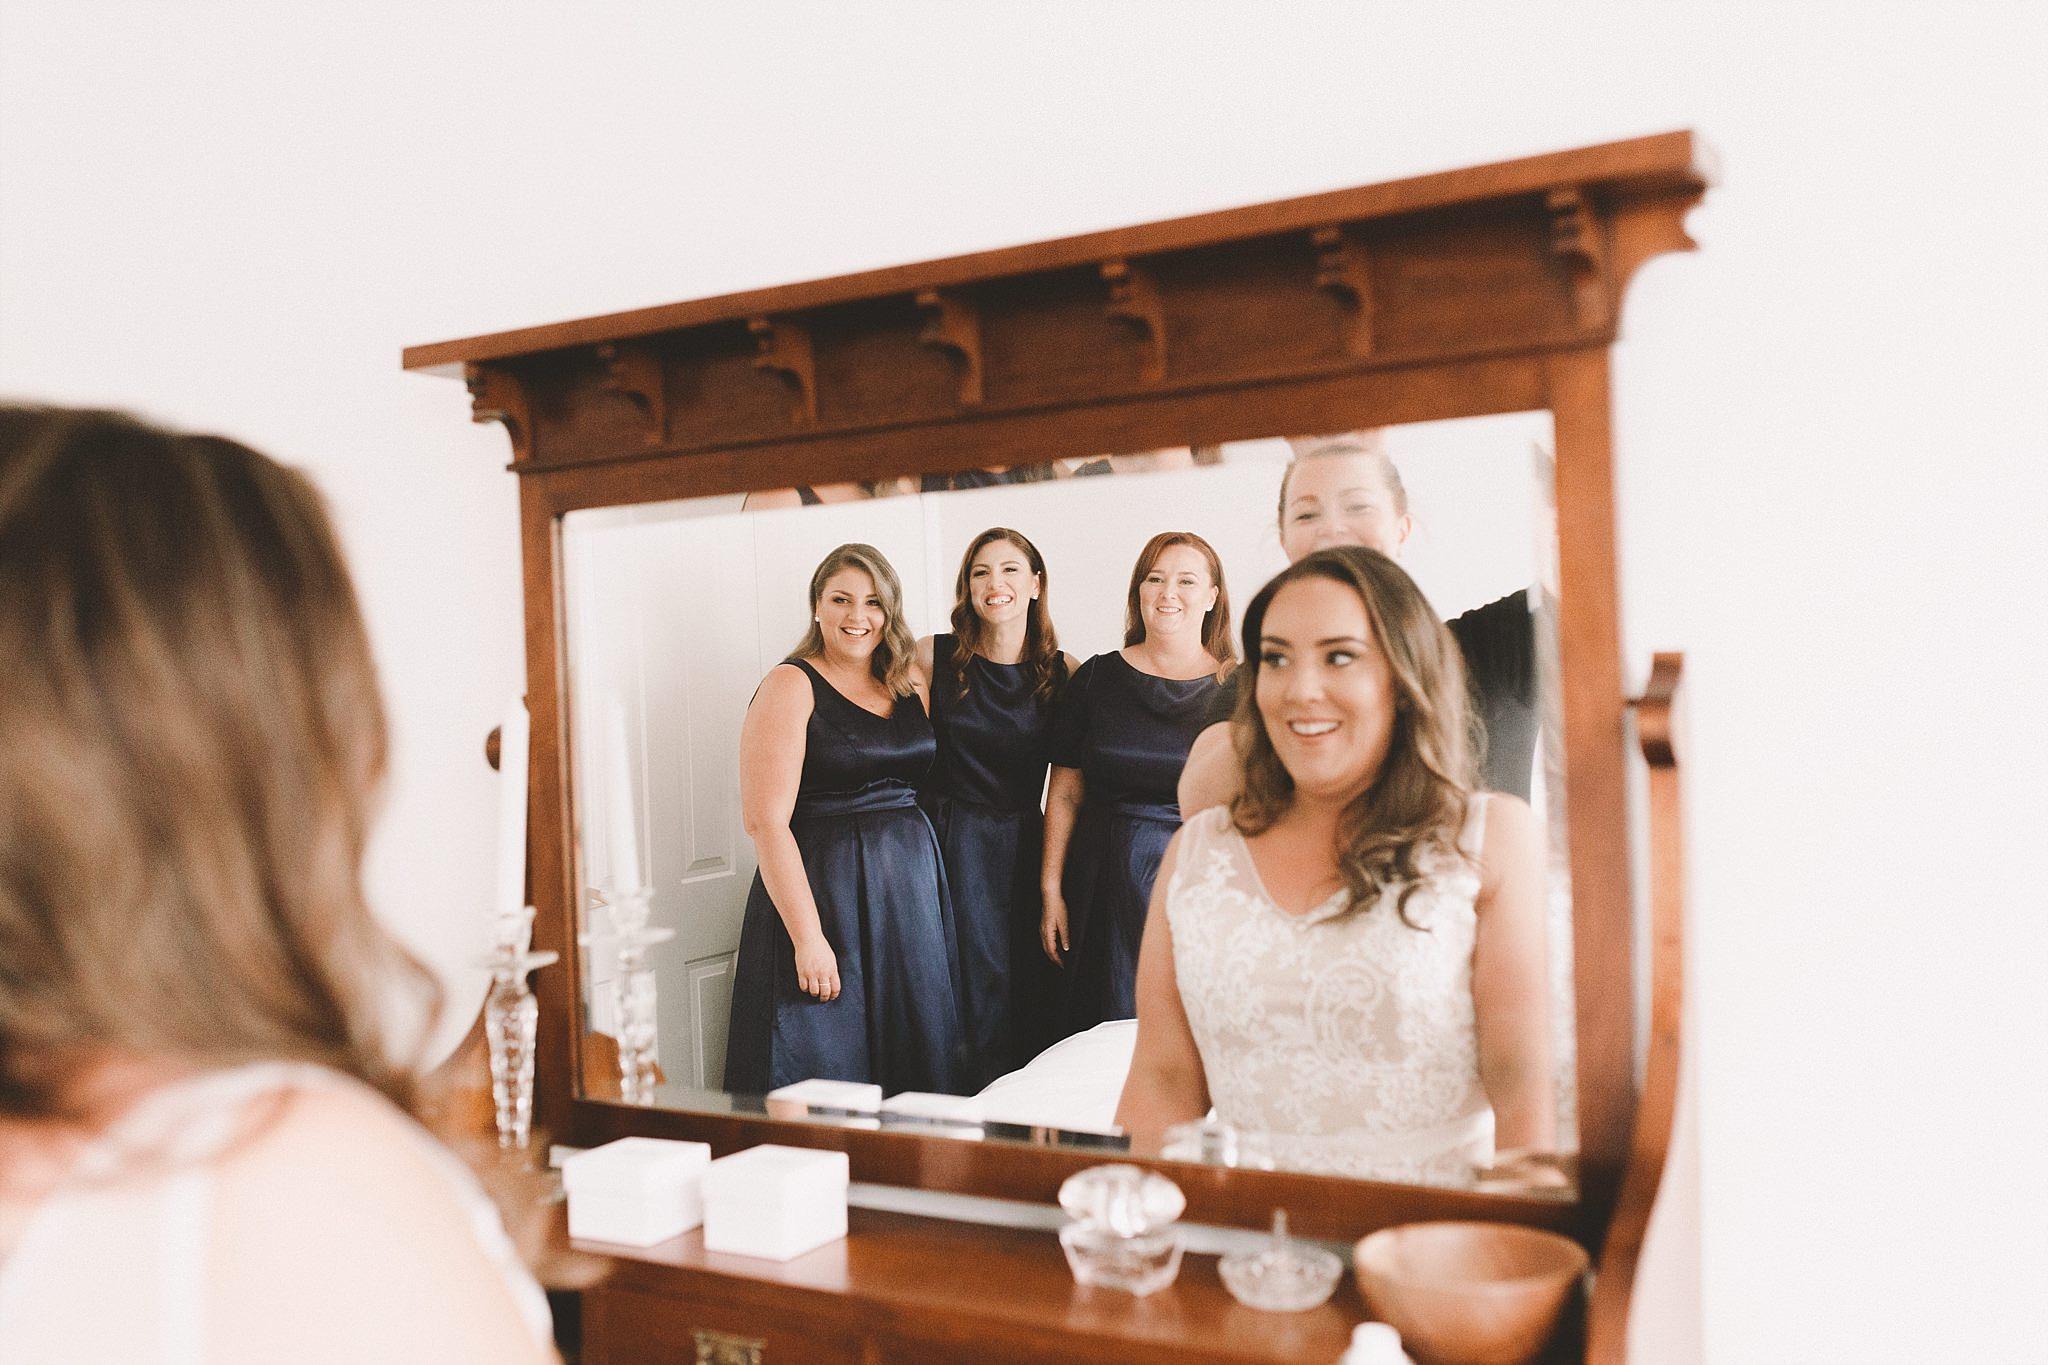 Mornington Peninsula Wedding Photographer 41.JPG